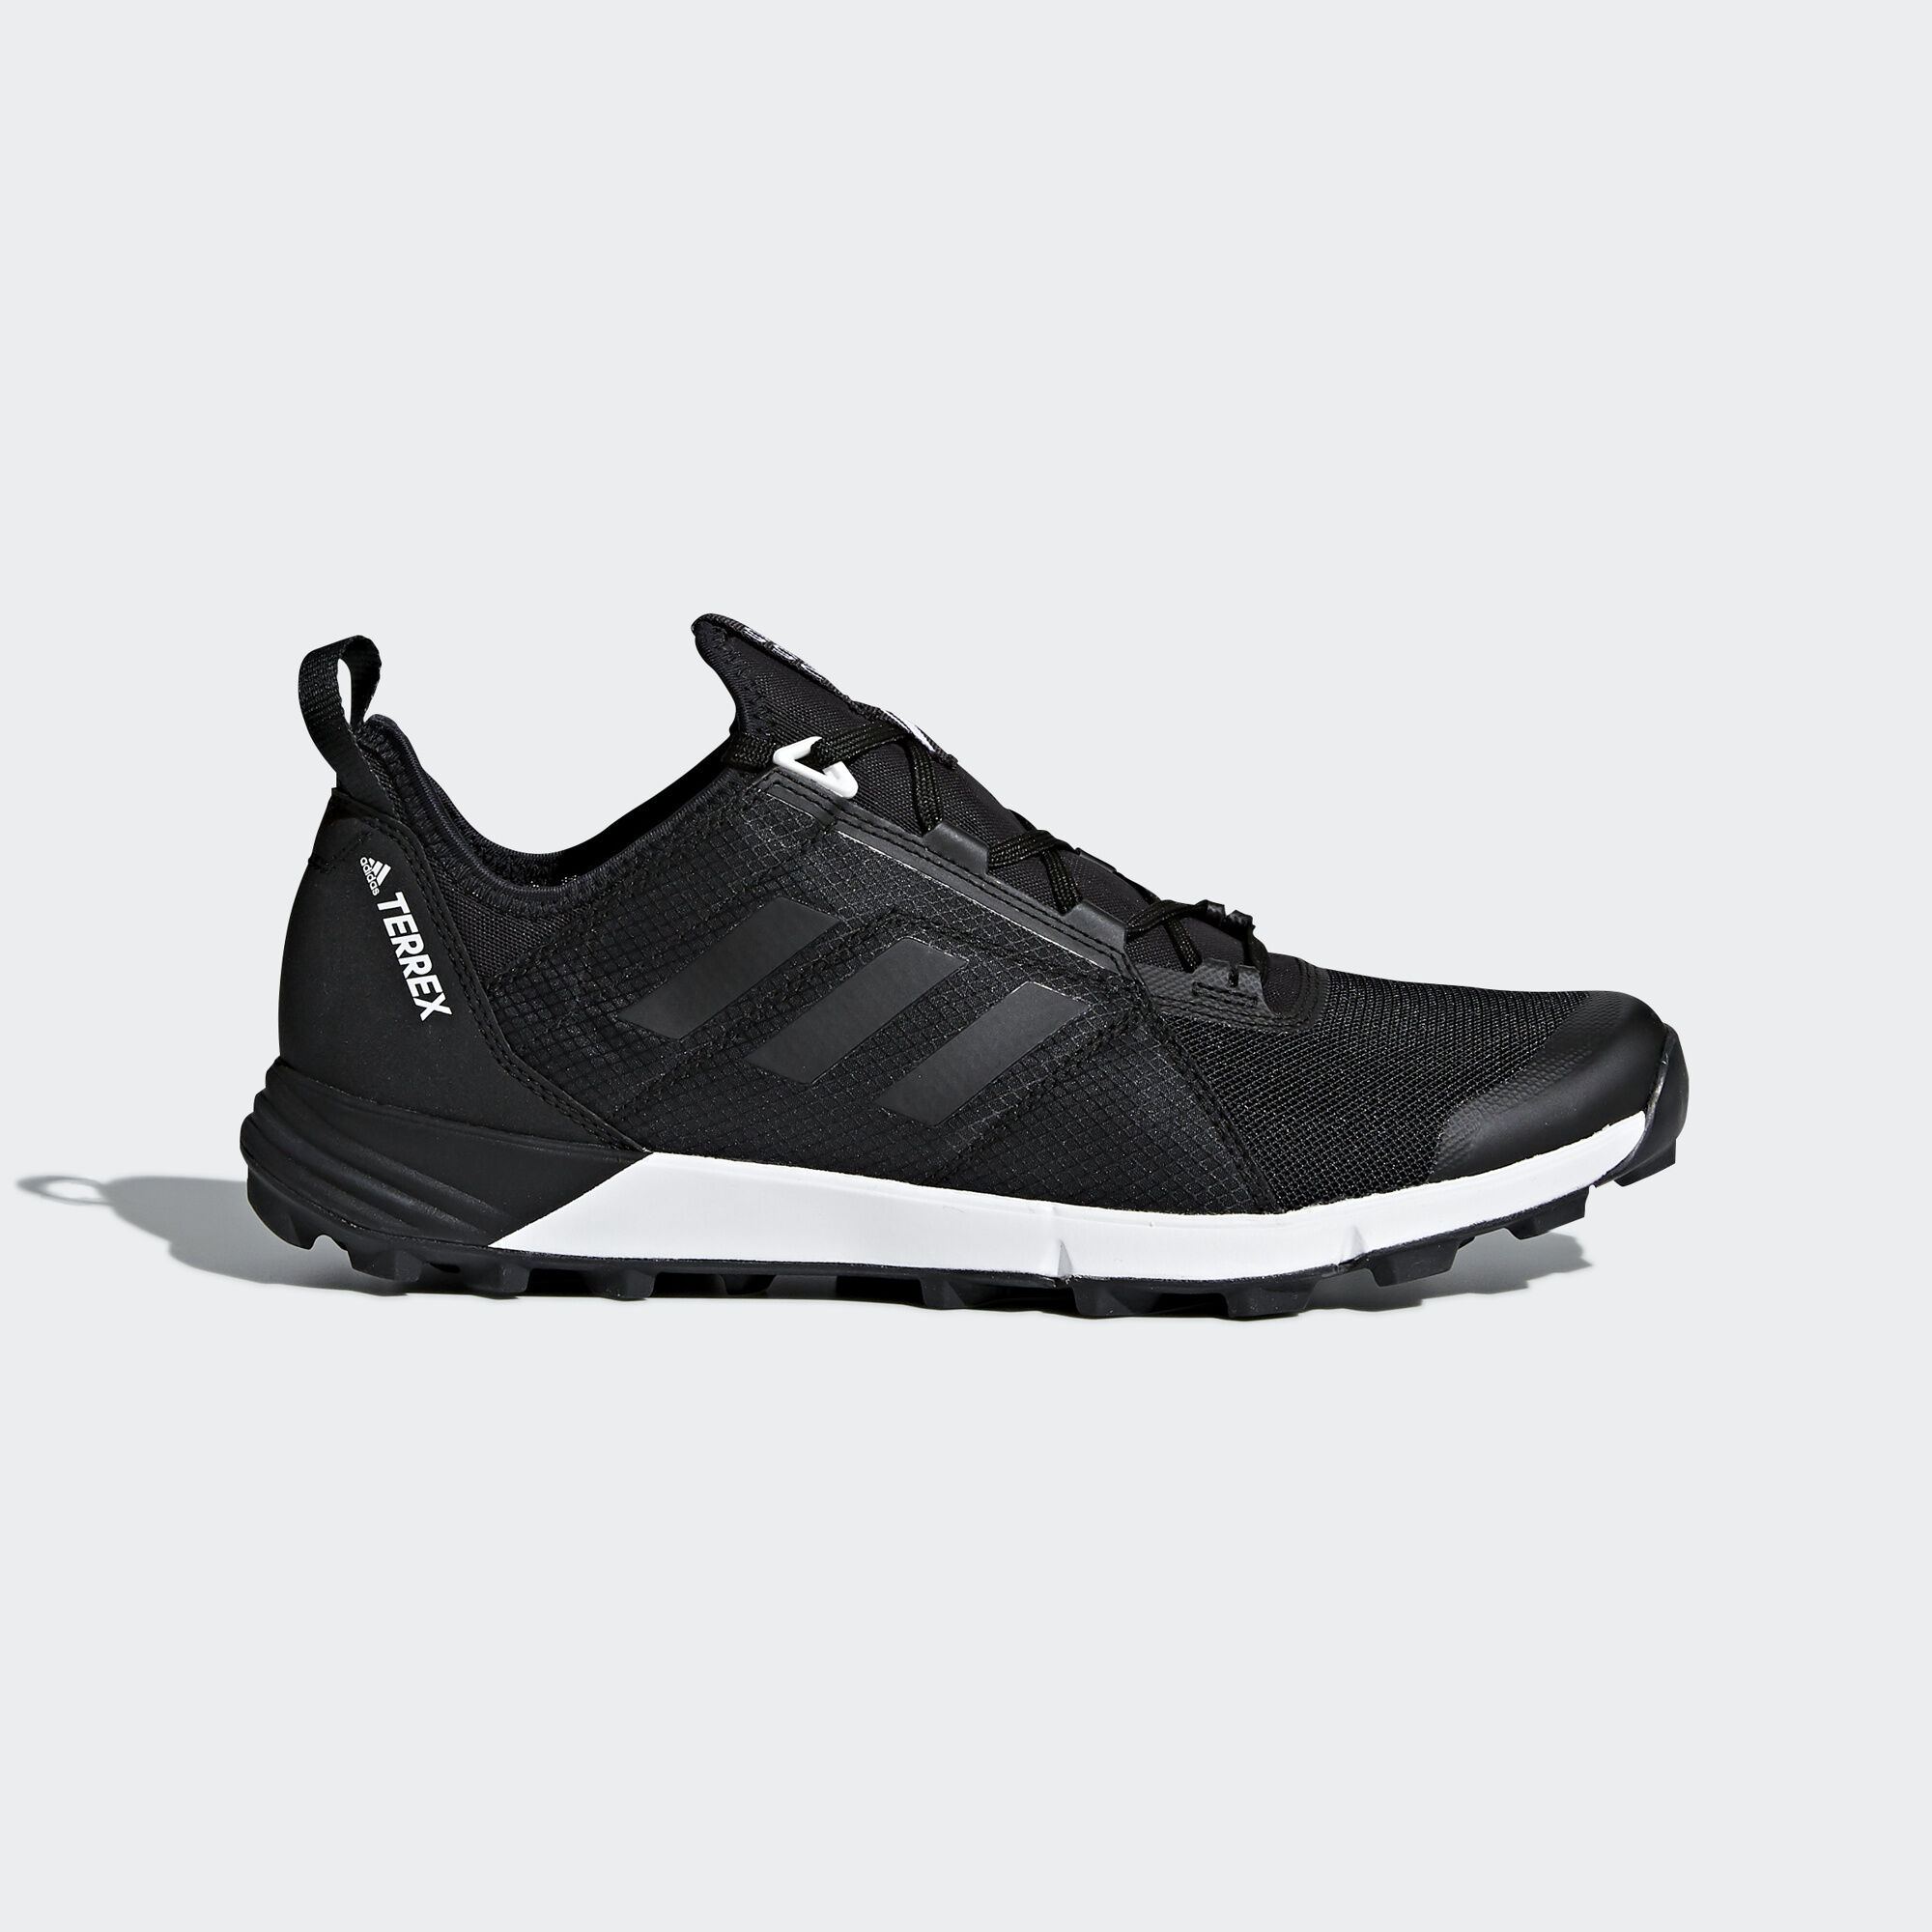 adidas TERREX Agravic Speed Shoes Women Core Black/Core Black/Ftwr White UK 4,5